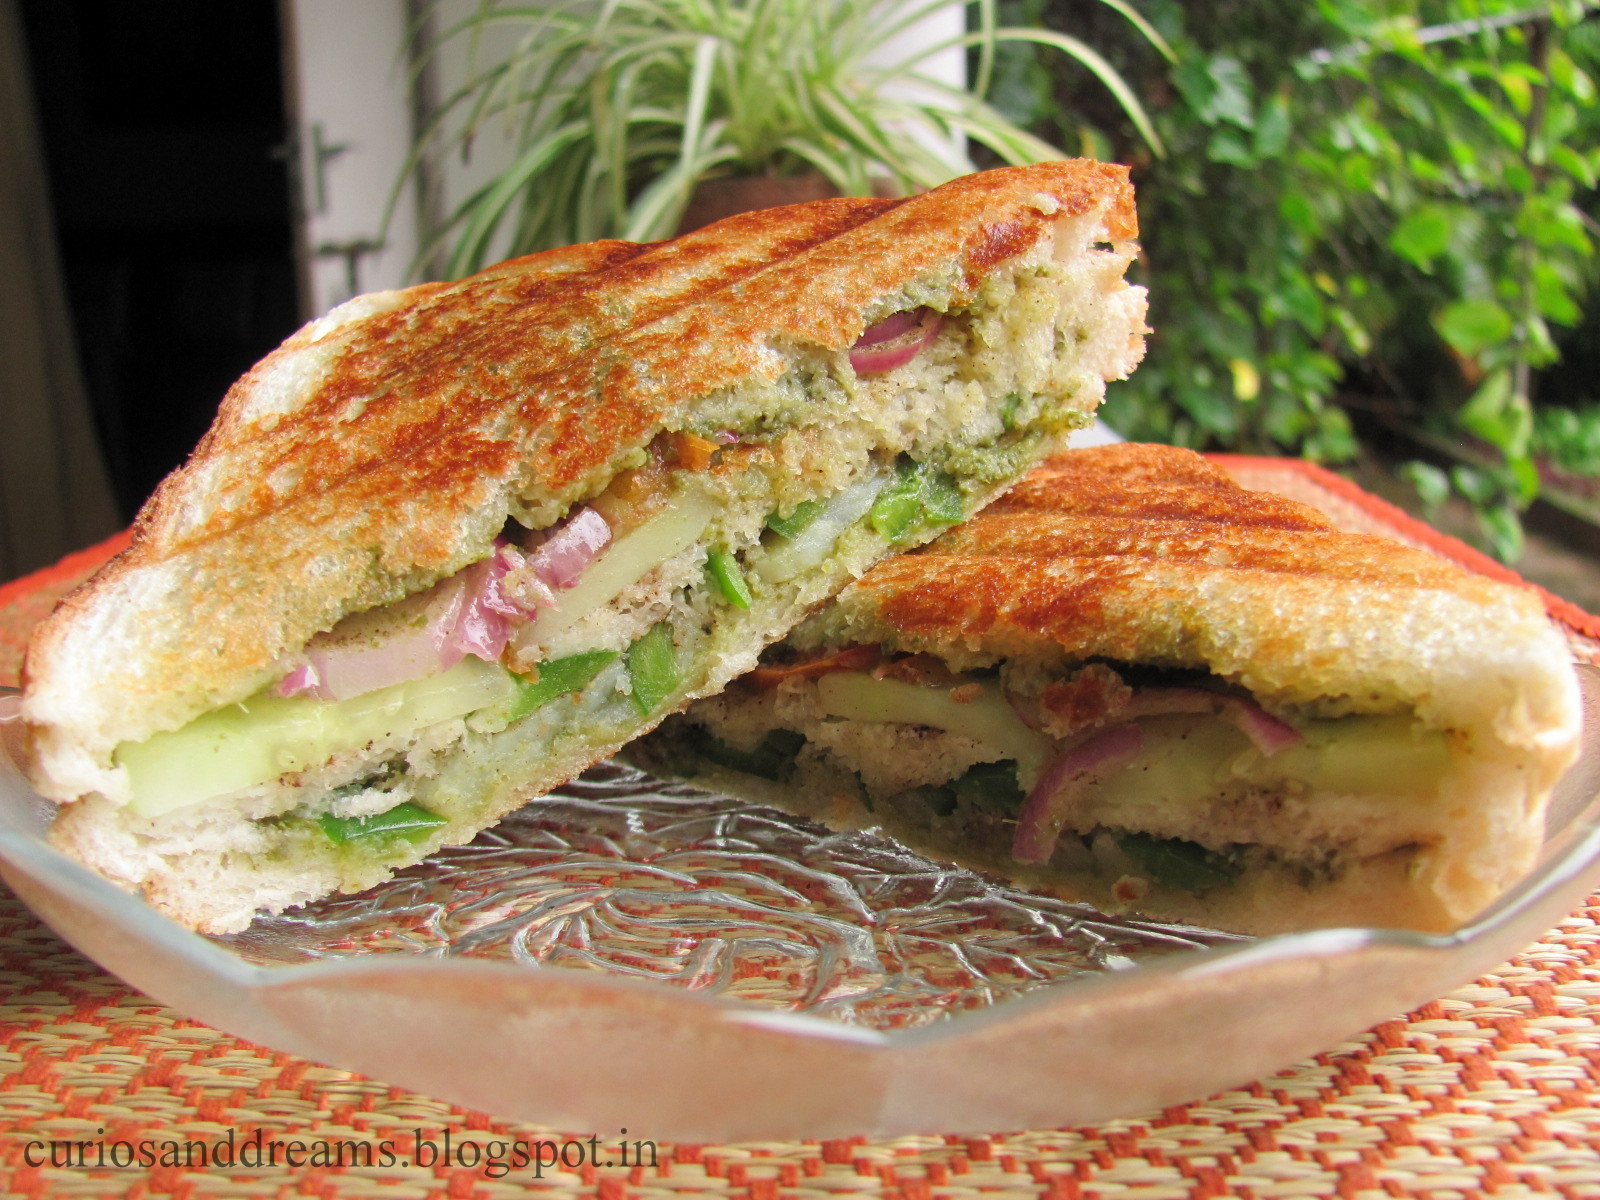 bombay sandwich by the classic bombay sandwich 5 the bombay sandwich ...